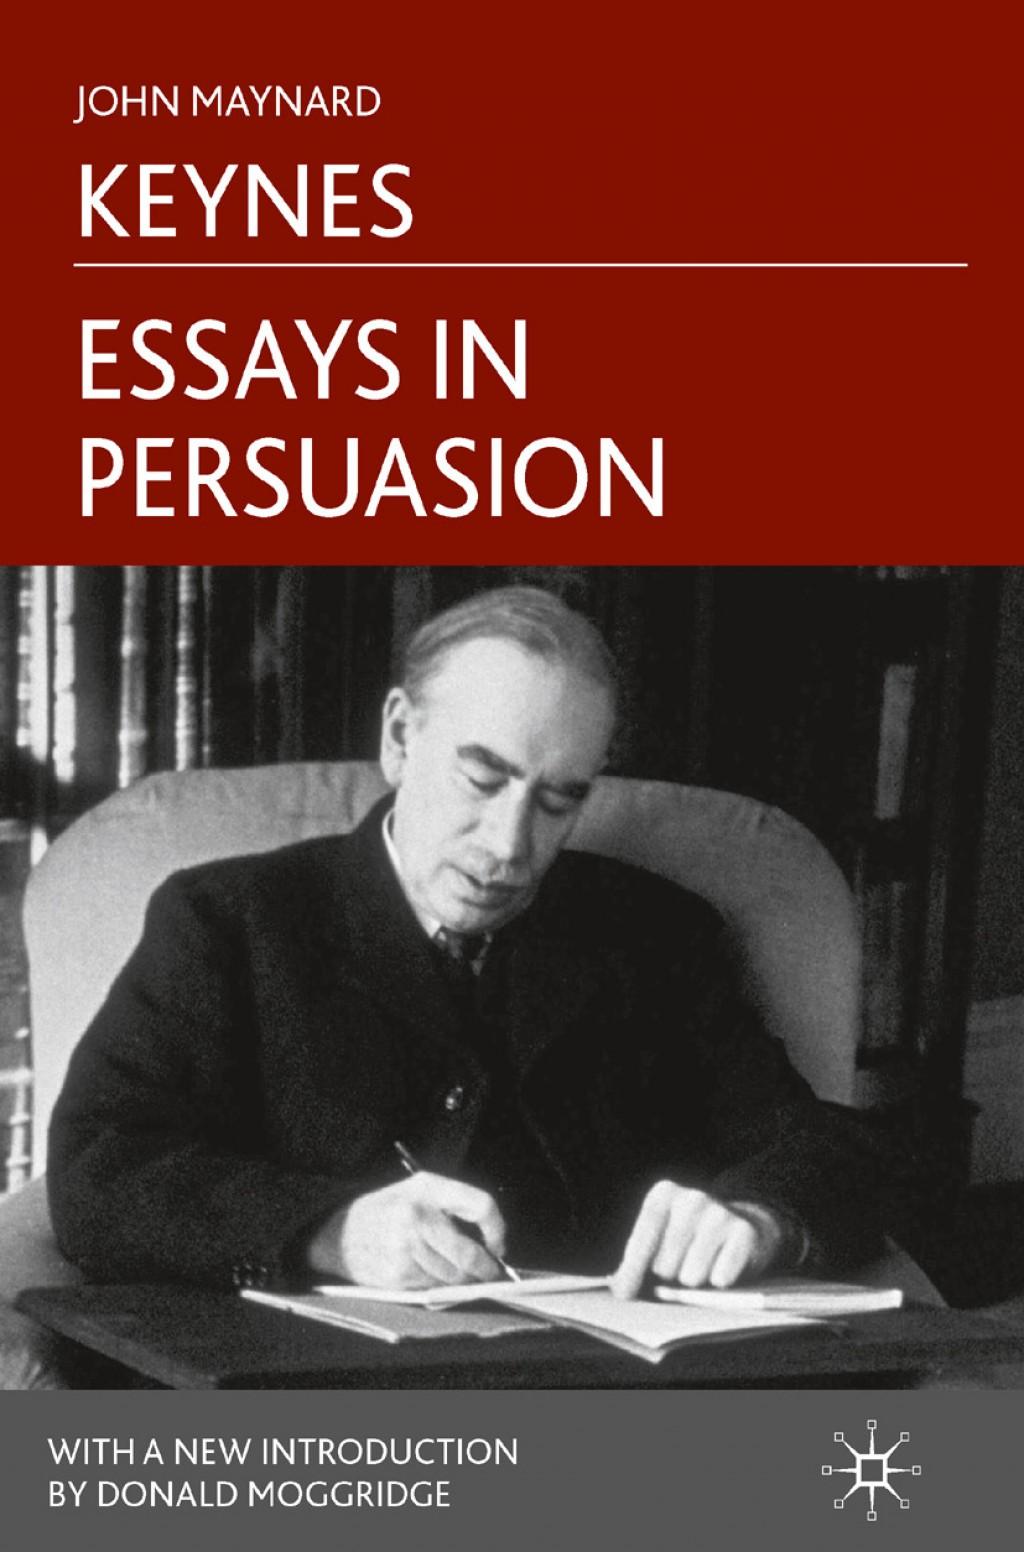 017 Essay Example Bookcover 978 Essays In Remarkable Persuasion Audiobook Pdf John Maynard Keynes Summary Large